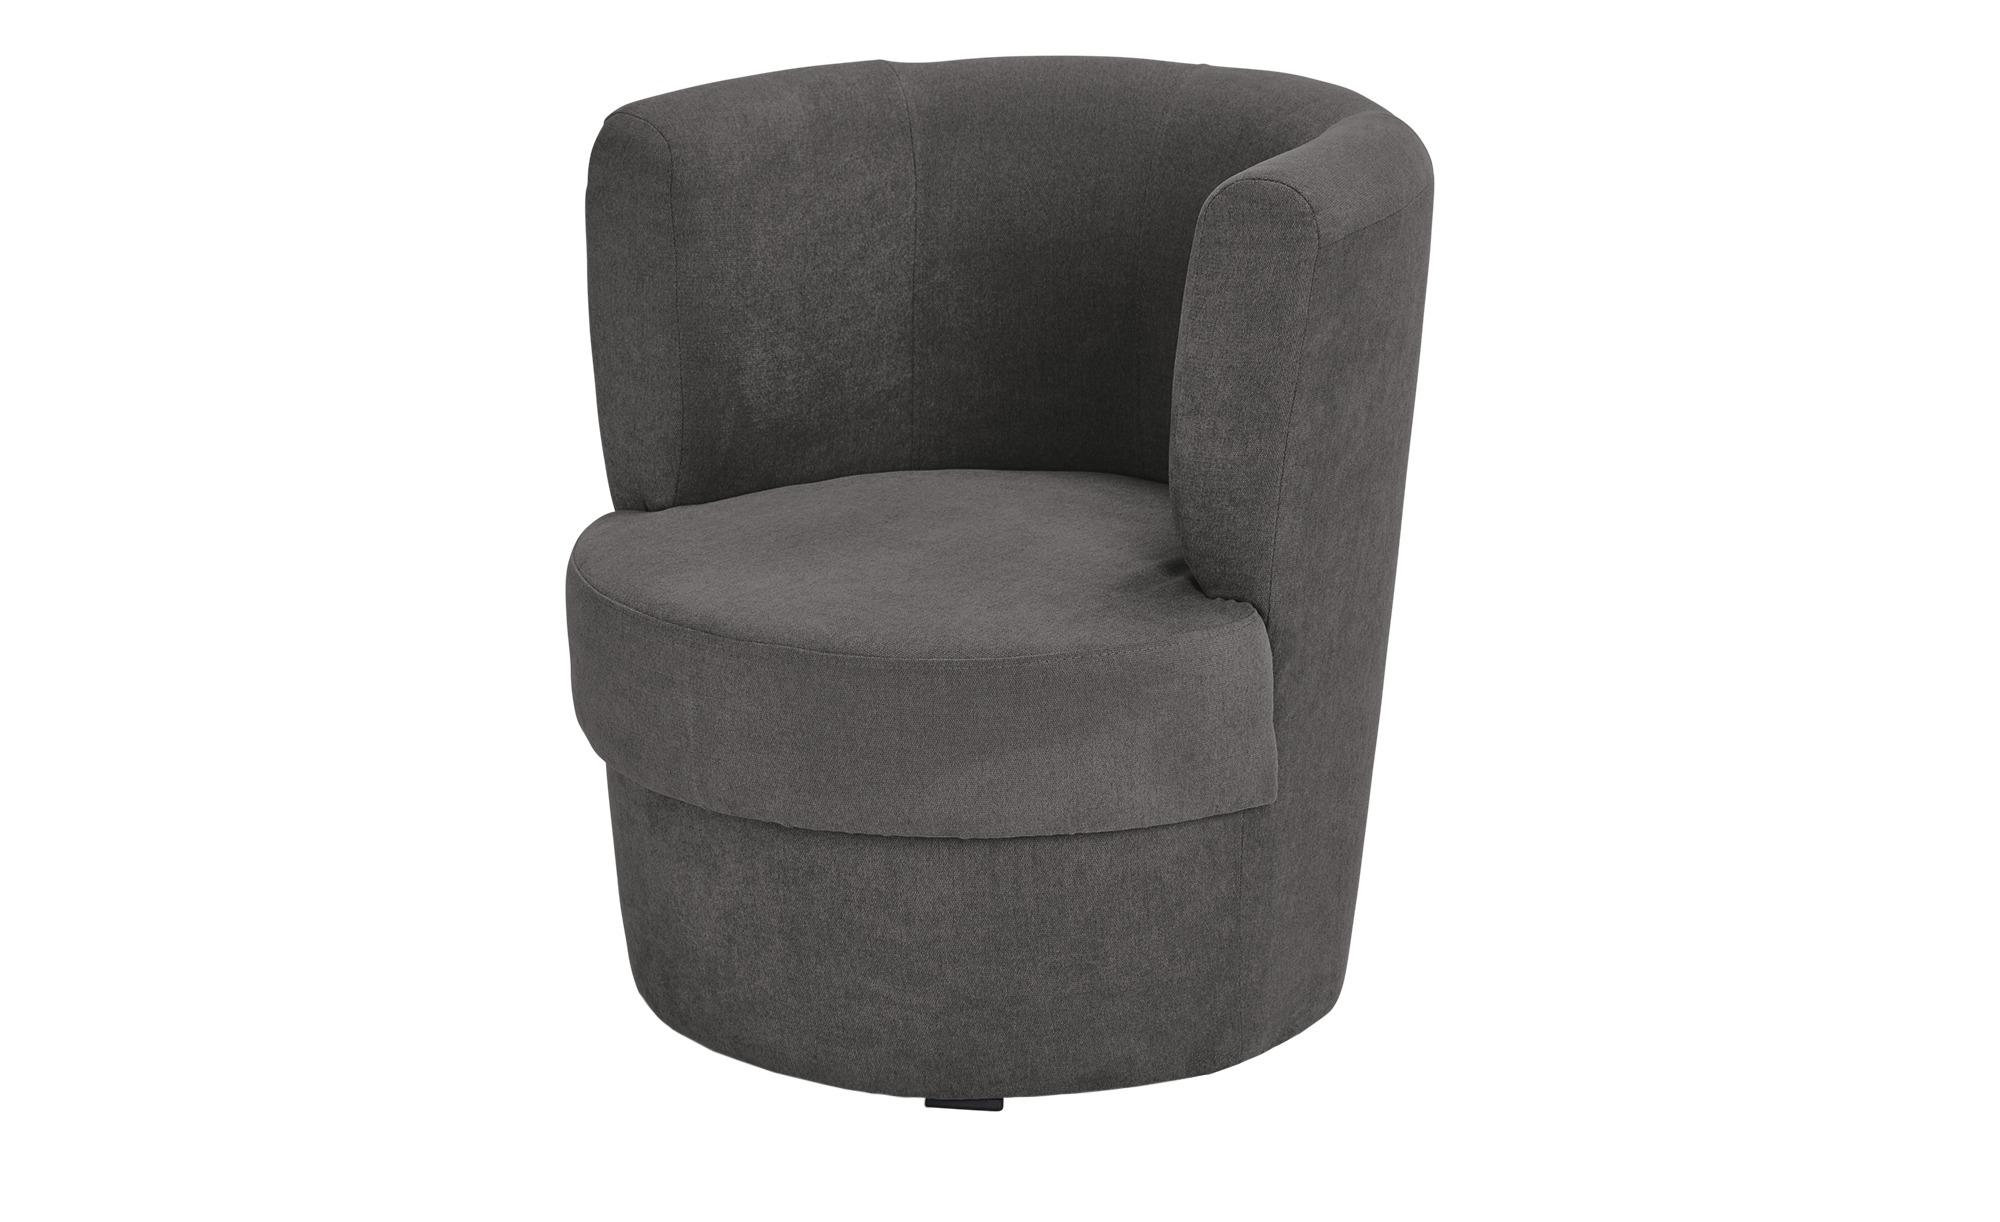 smart Sessel grau - Stoff Marina ¦ grau ¦ Maße (cm): B: 60 H: 69 T: 60 Polstermöbel > Sessel > Polstersessel - Höffner